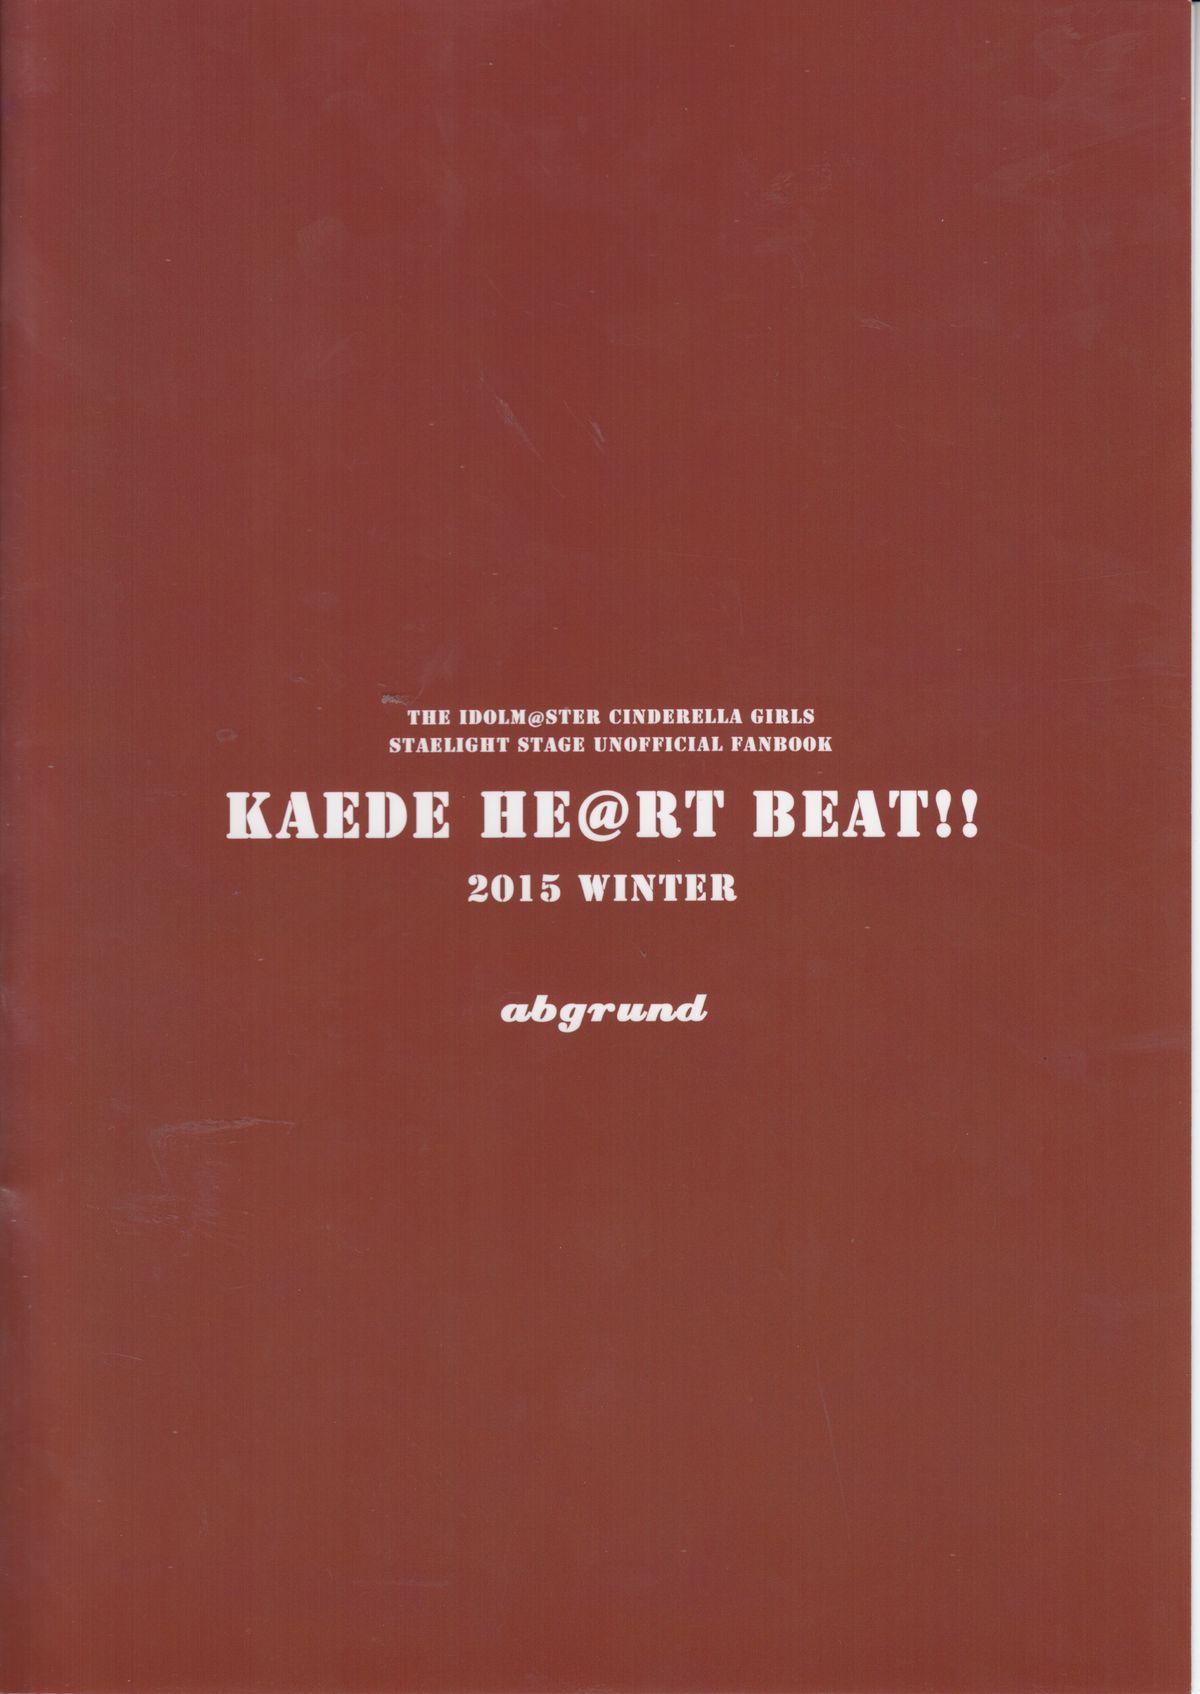 KAEDE HEART BEAT!! 27